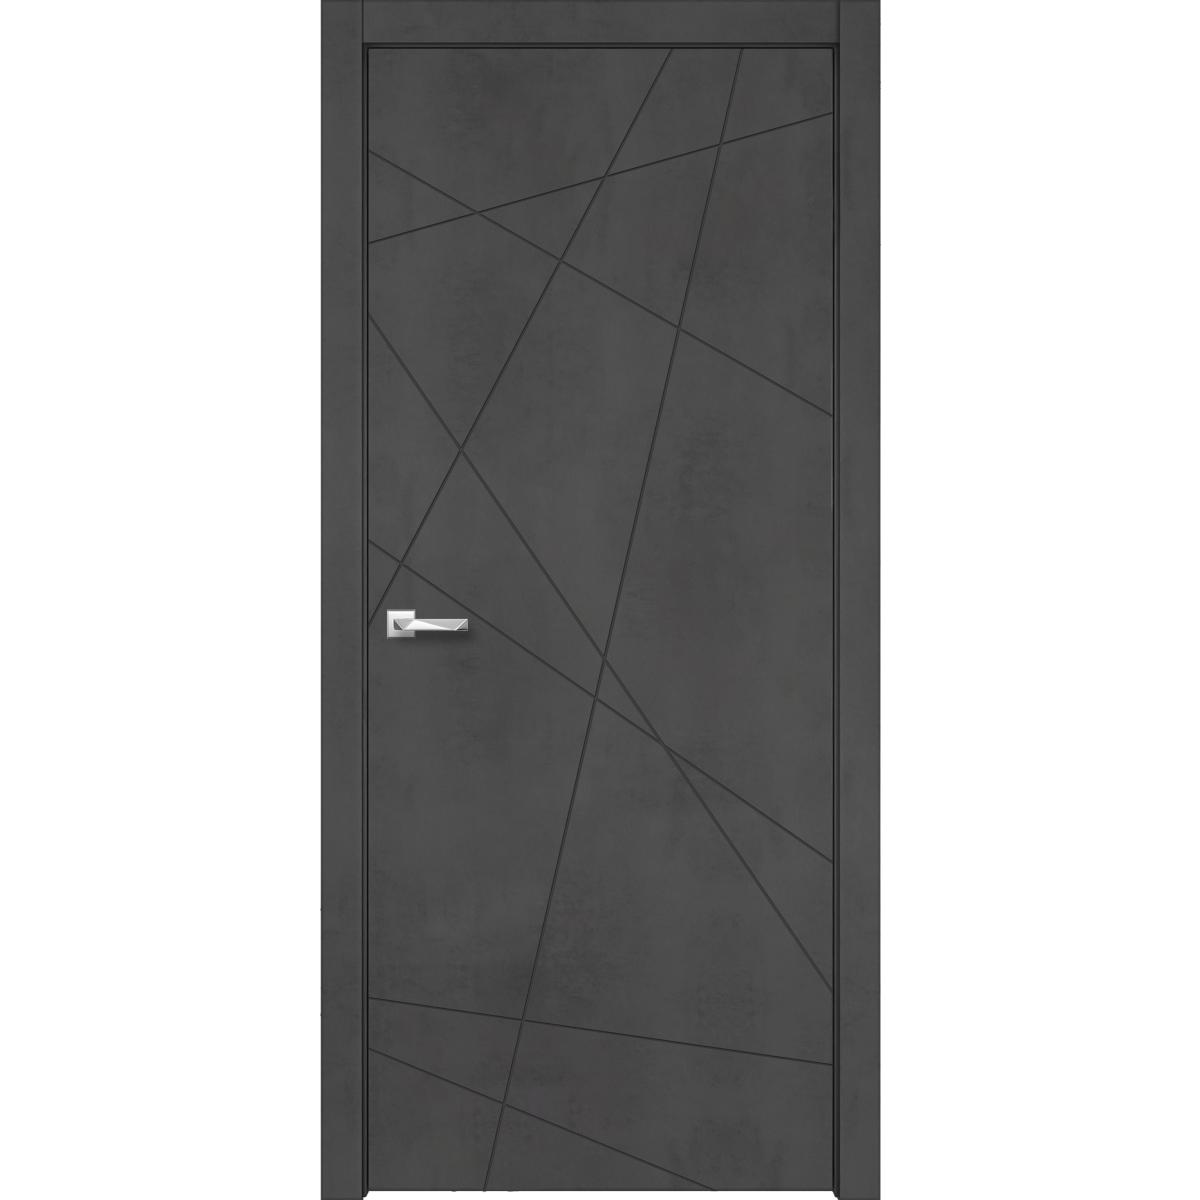 Дверное полотно Loyard Севилья МП_0373 2000х600х44 мм МДФ